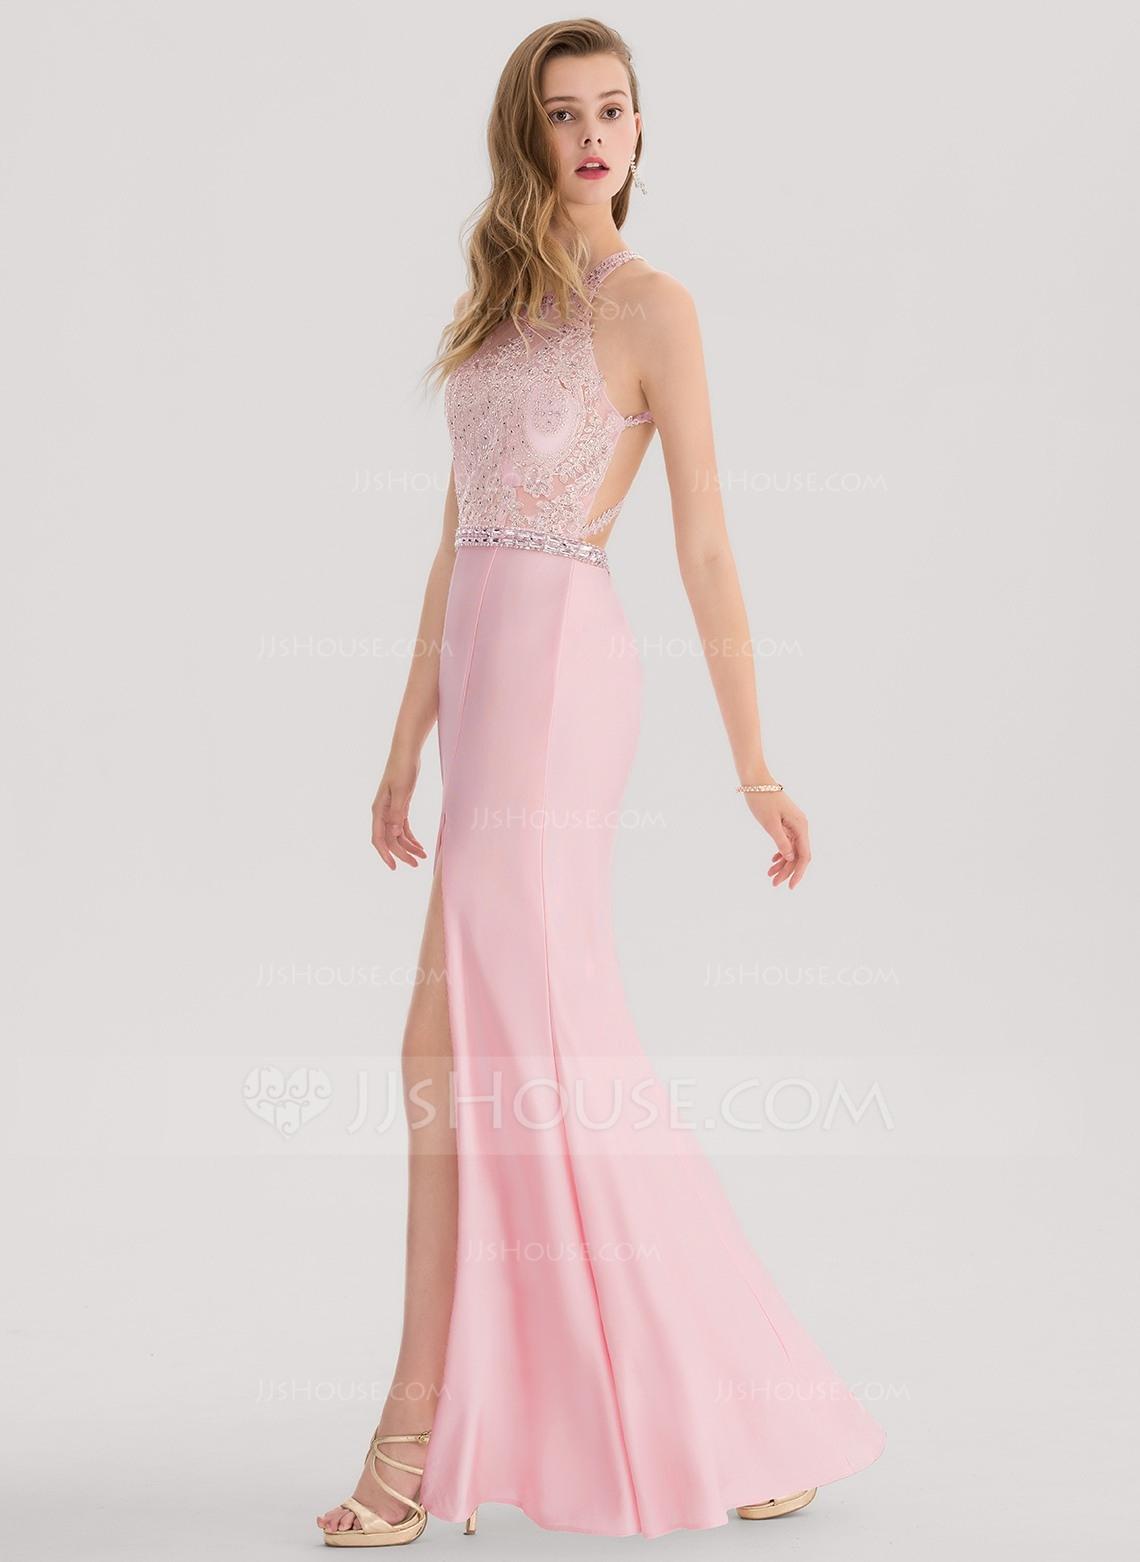 20 Genial Abiball Kleid für 2019 Genial Abiball Kleid für 2019